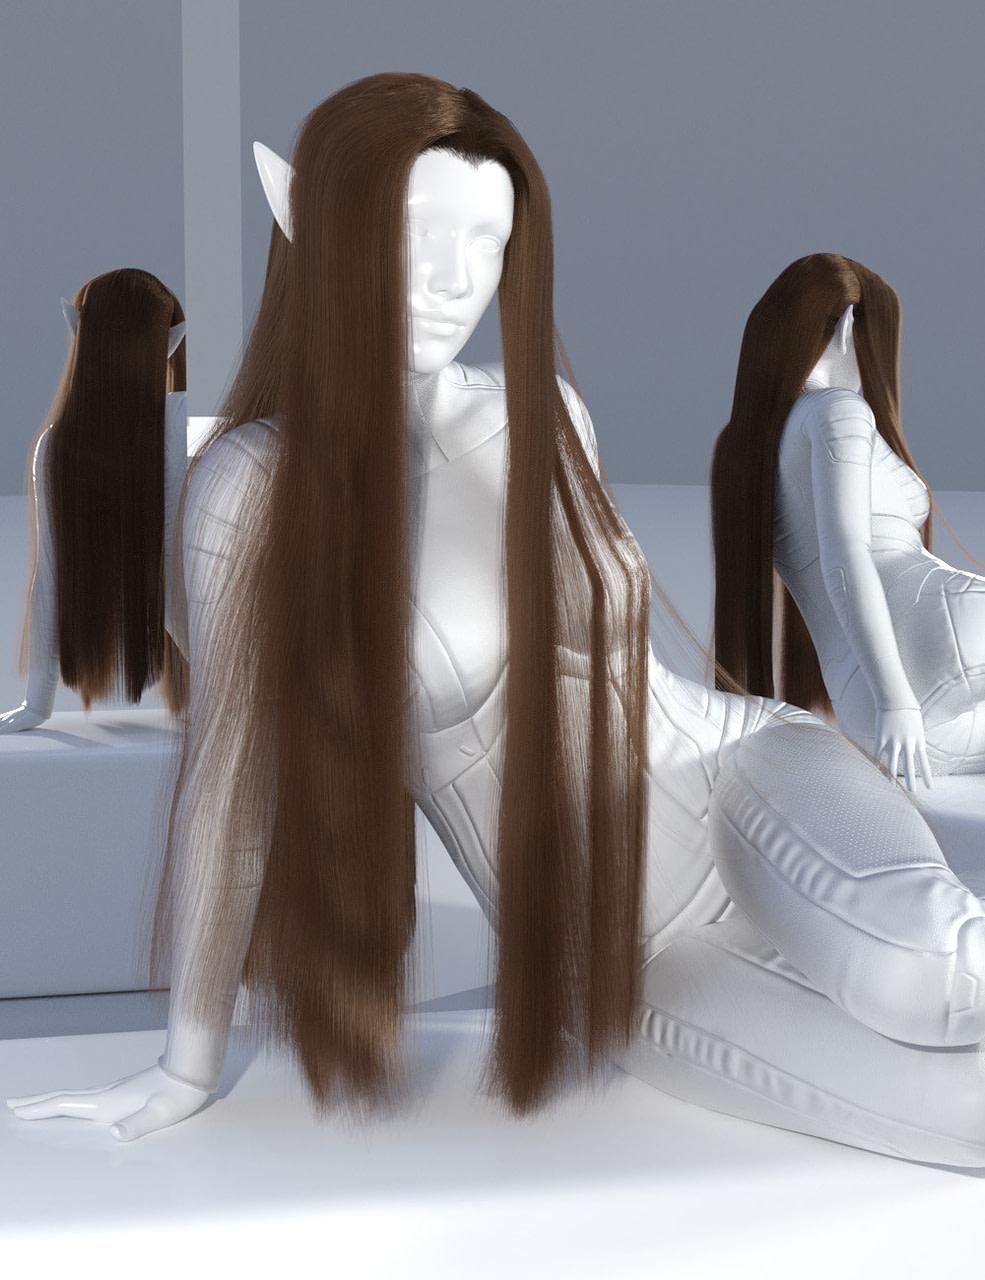 daz studio dforce elven lord hair